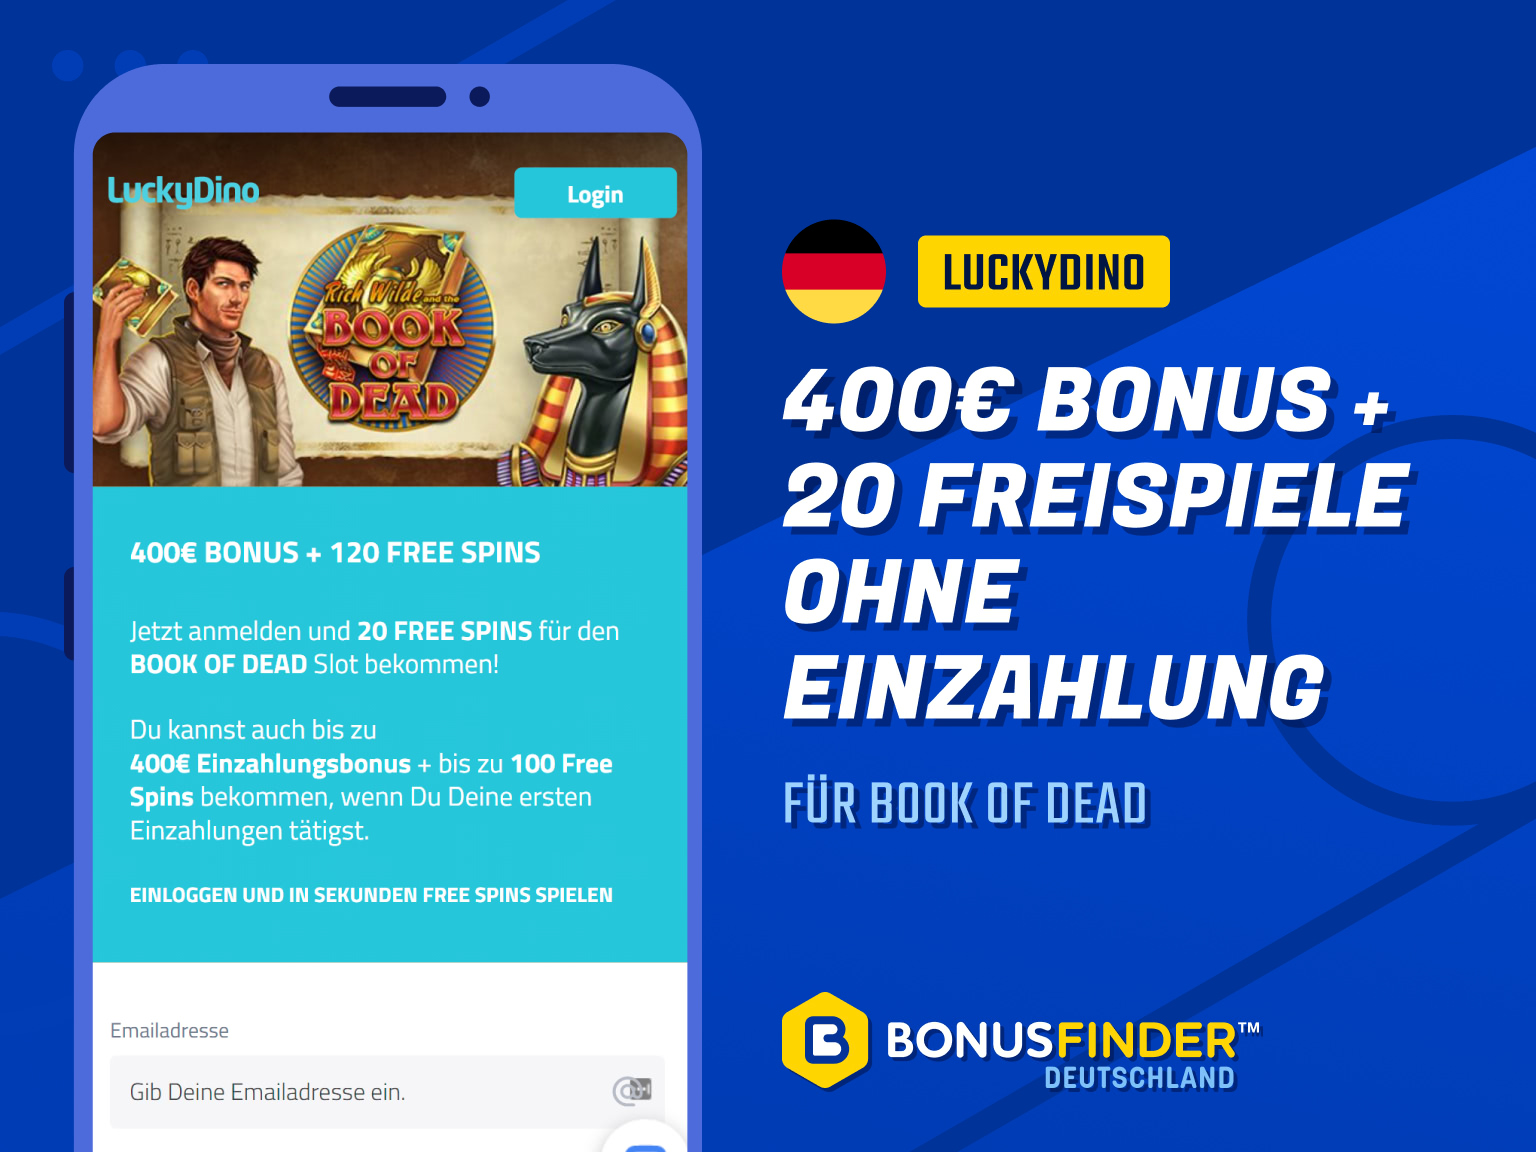 luckydino no deposit bonus